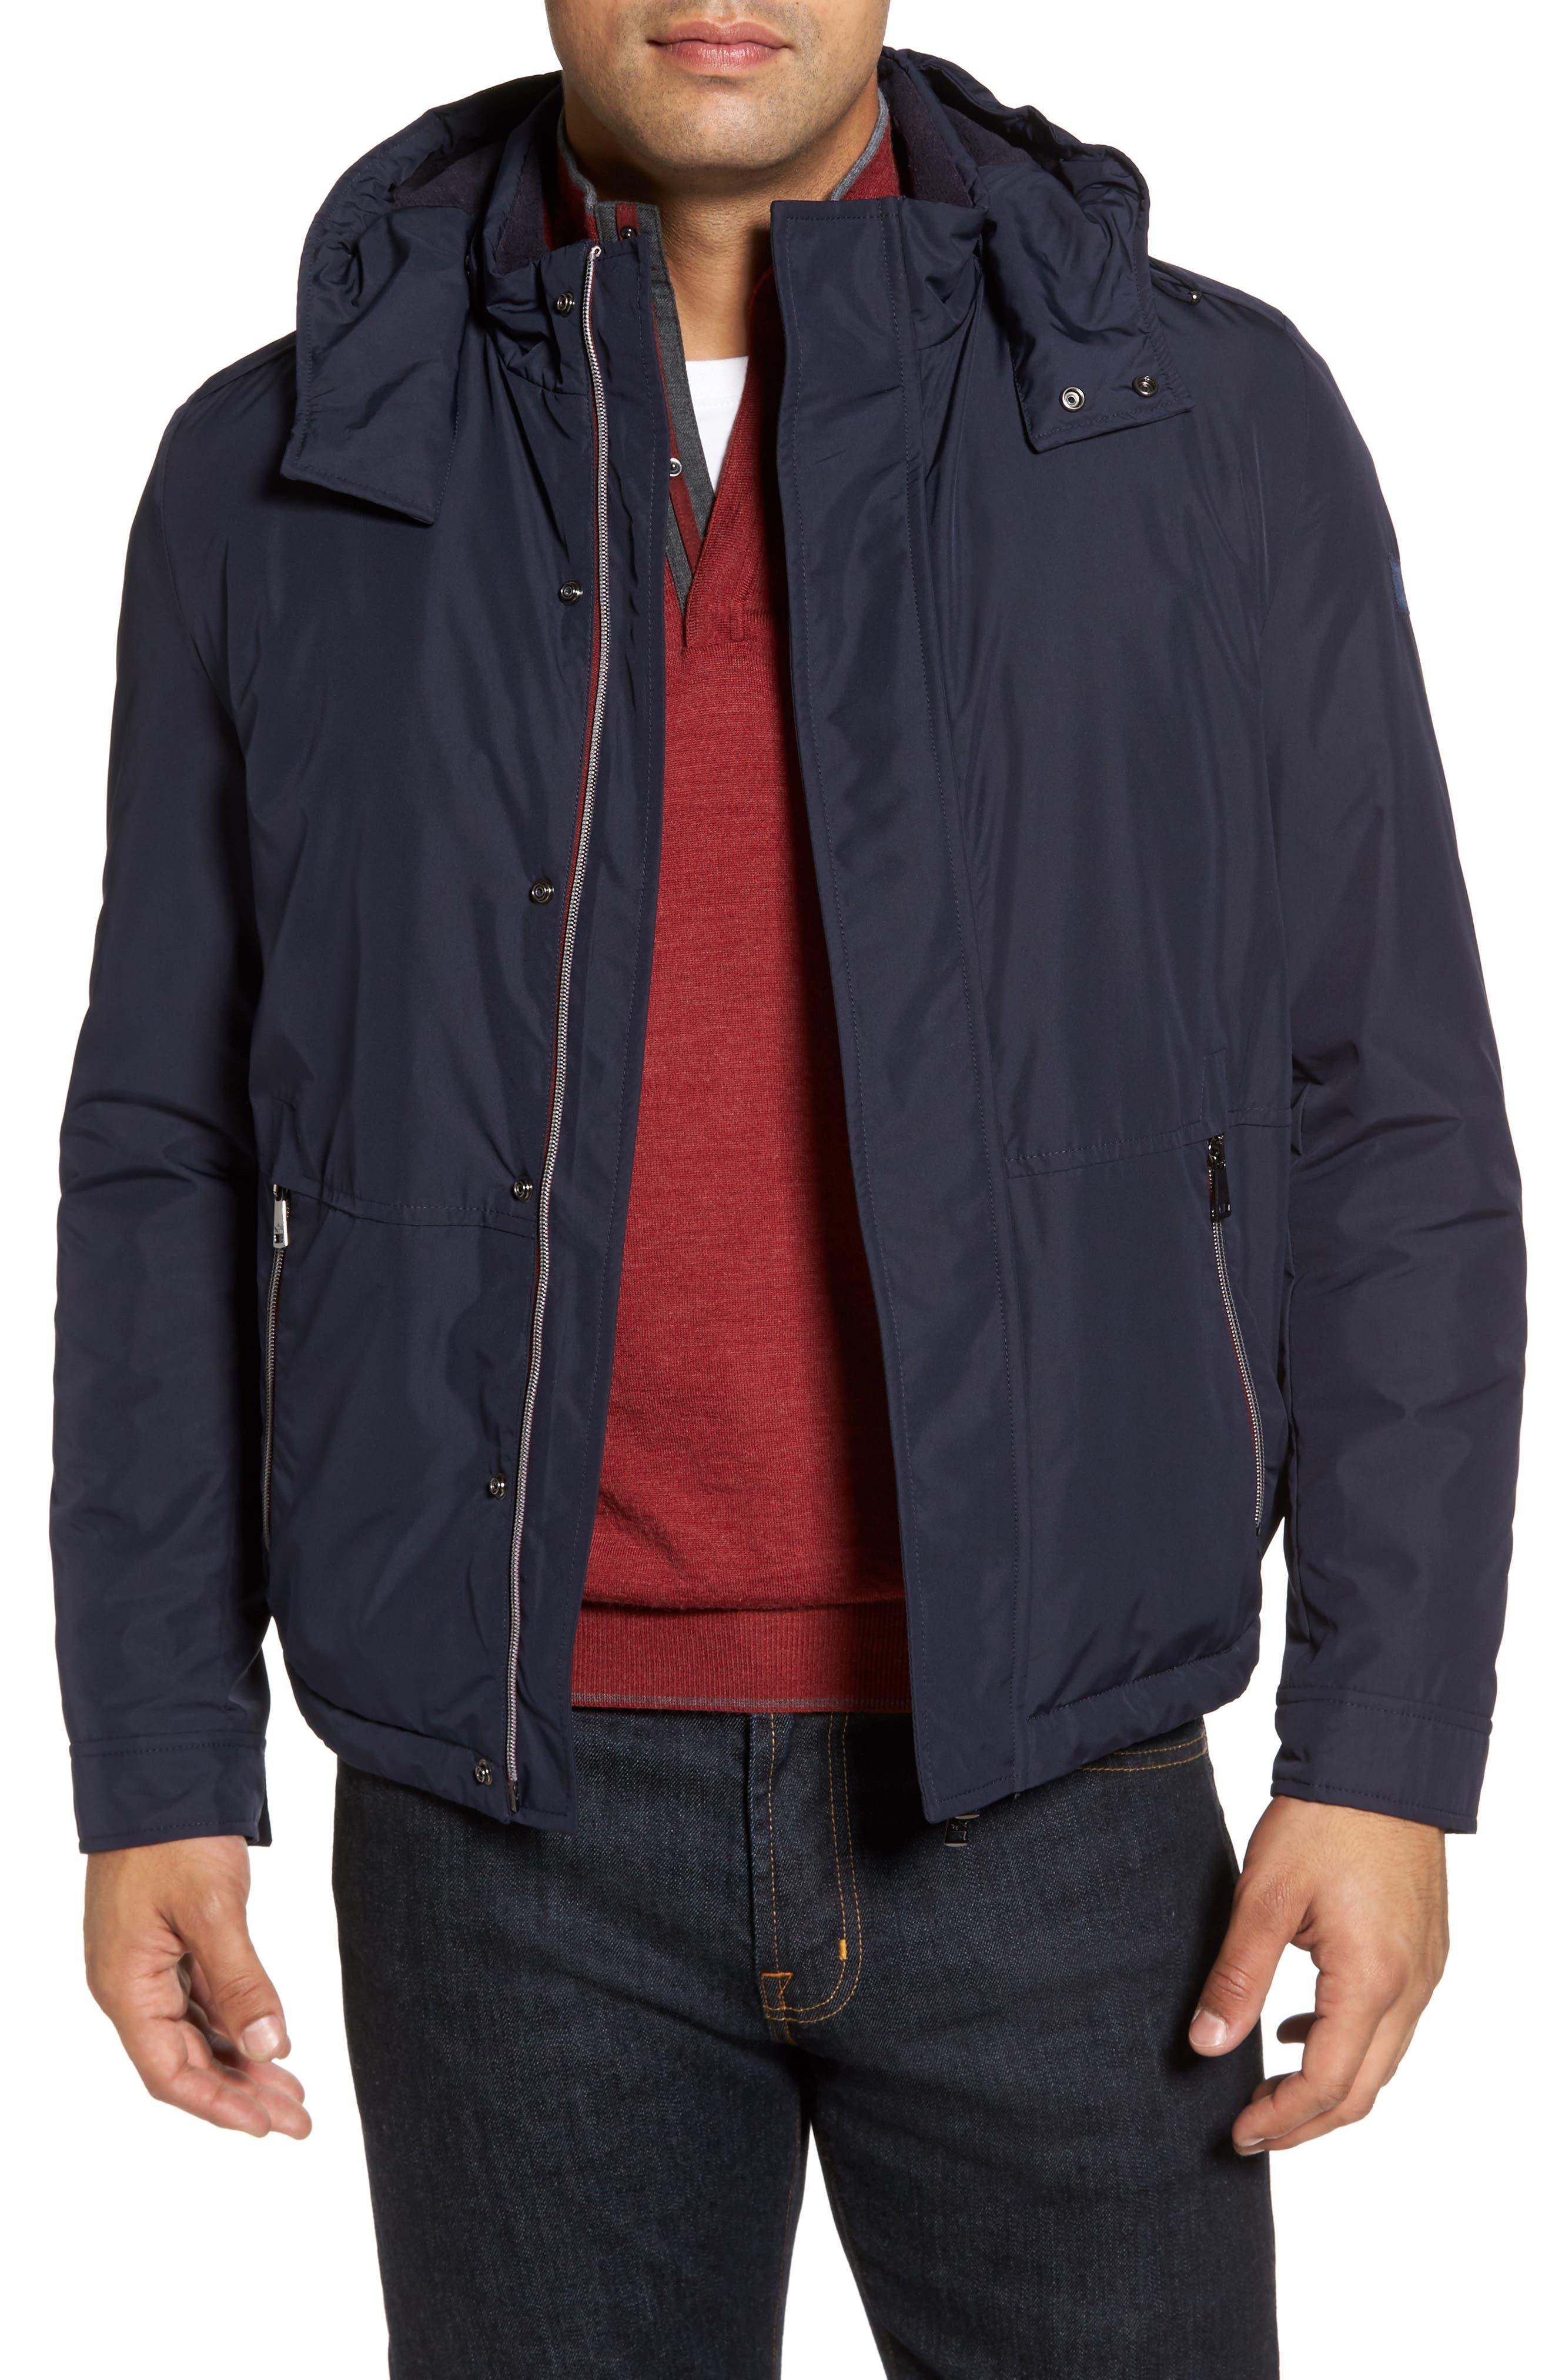 Paul & Shark Fleece Lined Hooded Jacket